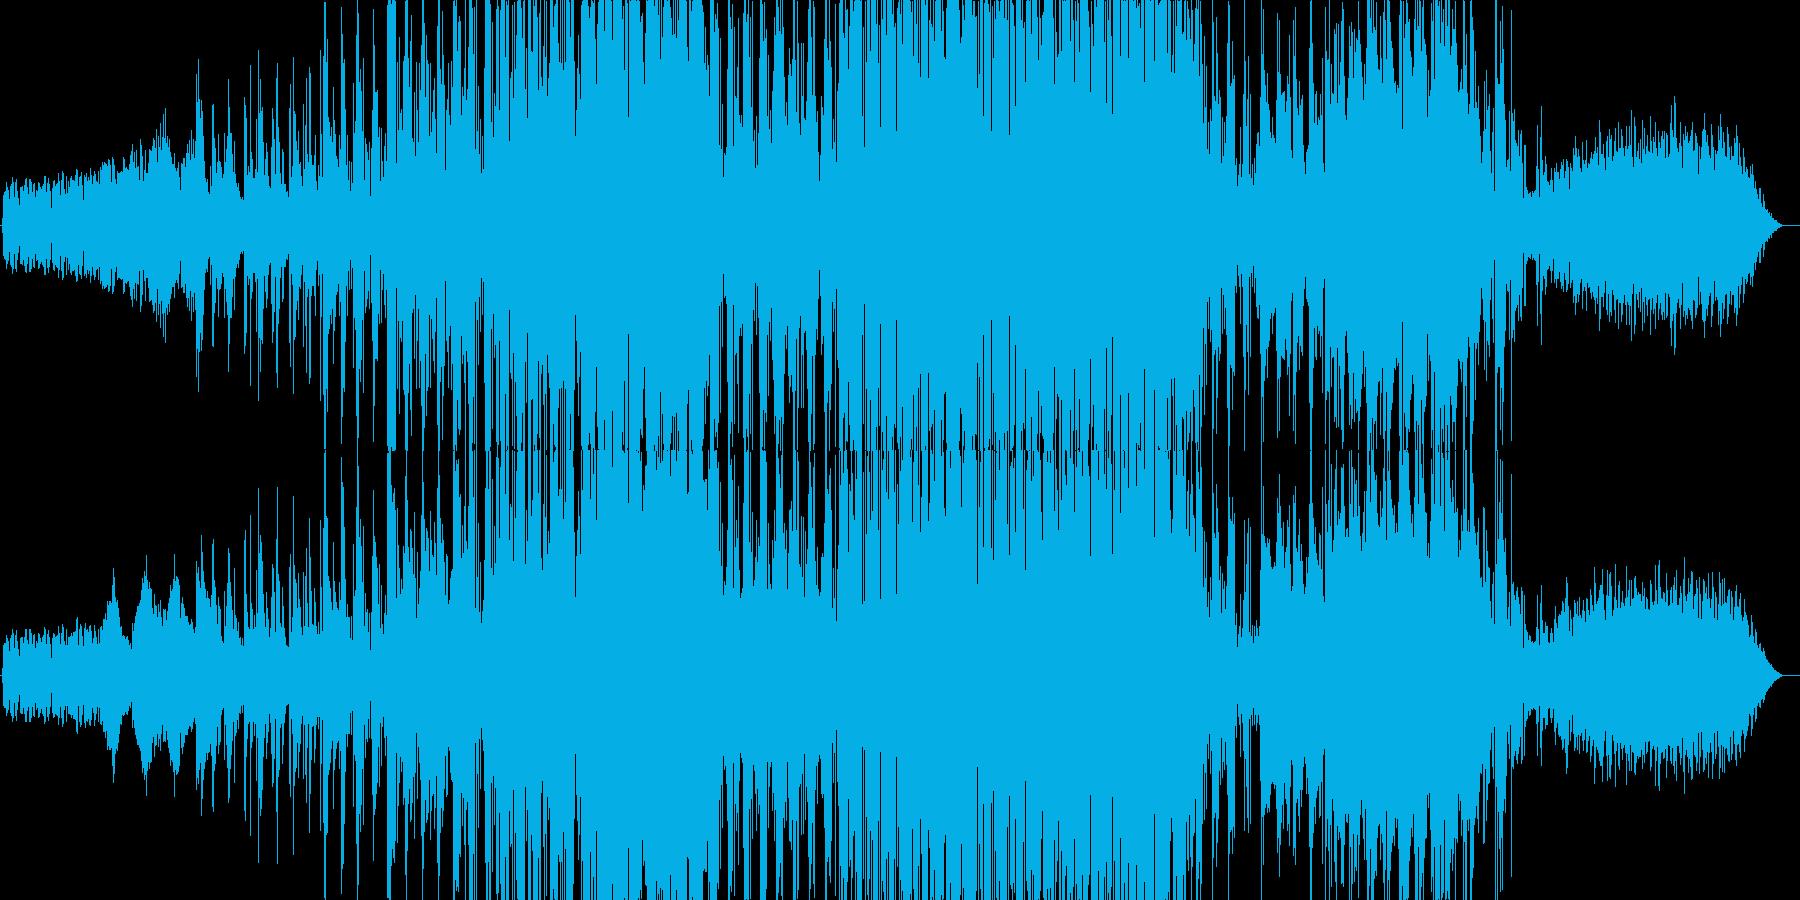 Half Step Aheadの再生済みの波形